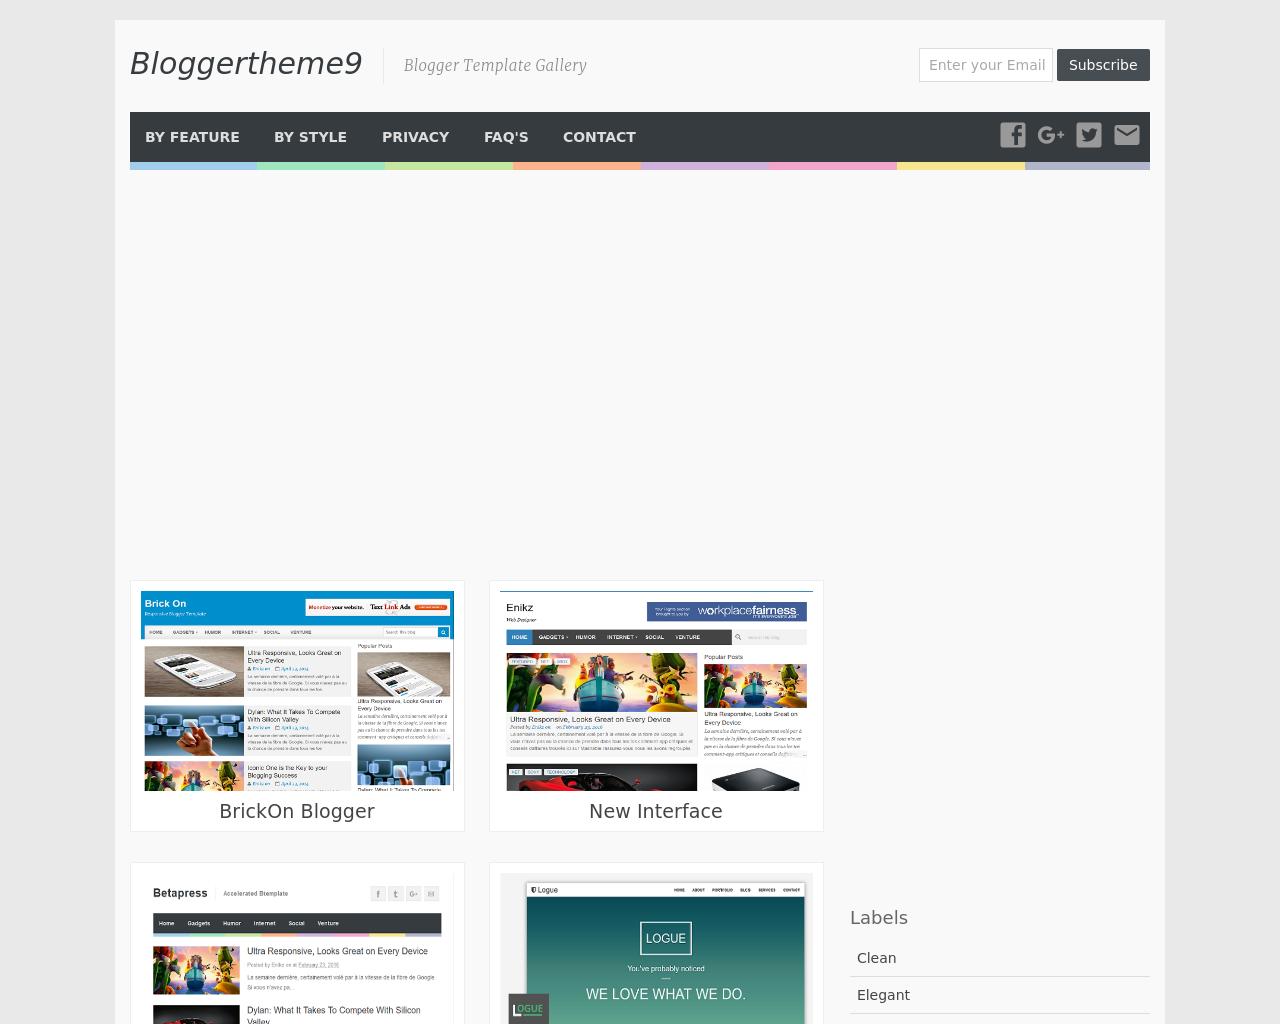 Bloggertheme9-Advertising-Reviews-Pricing